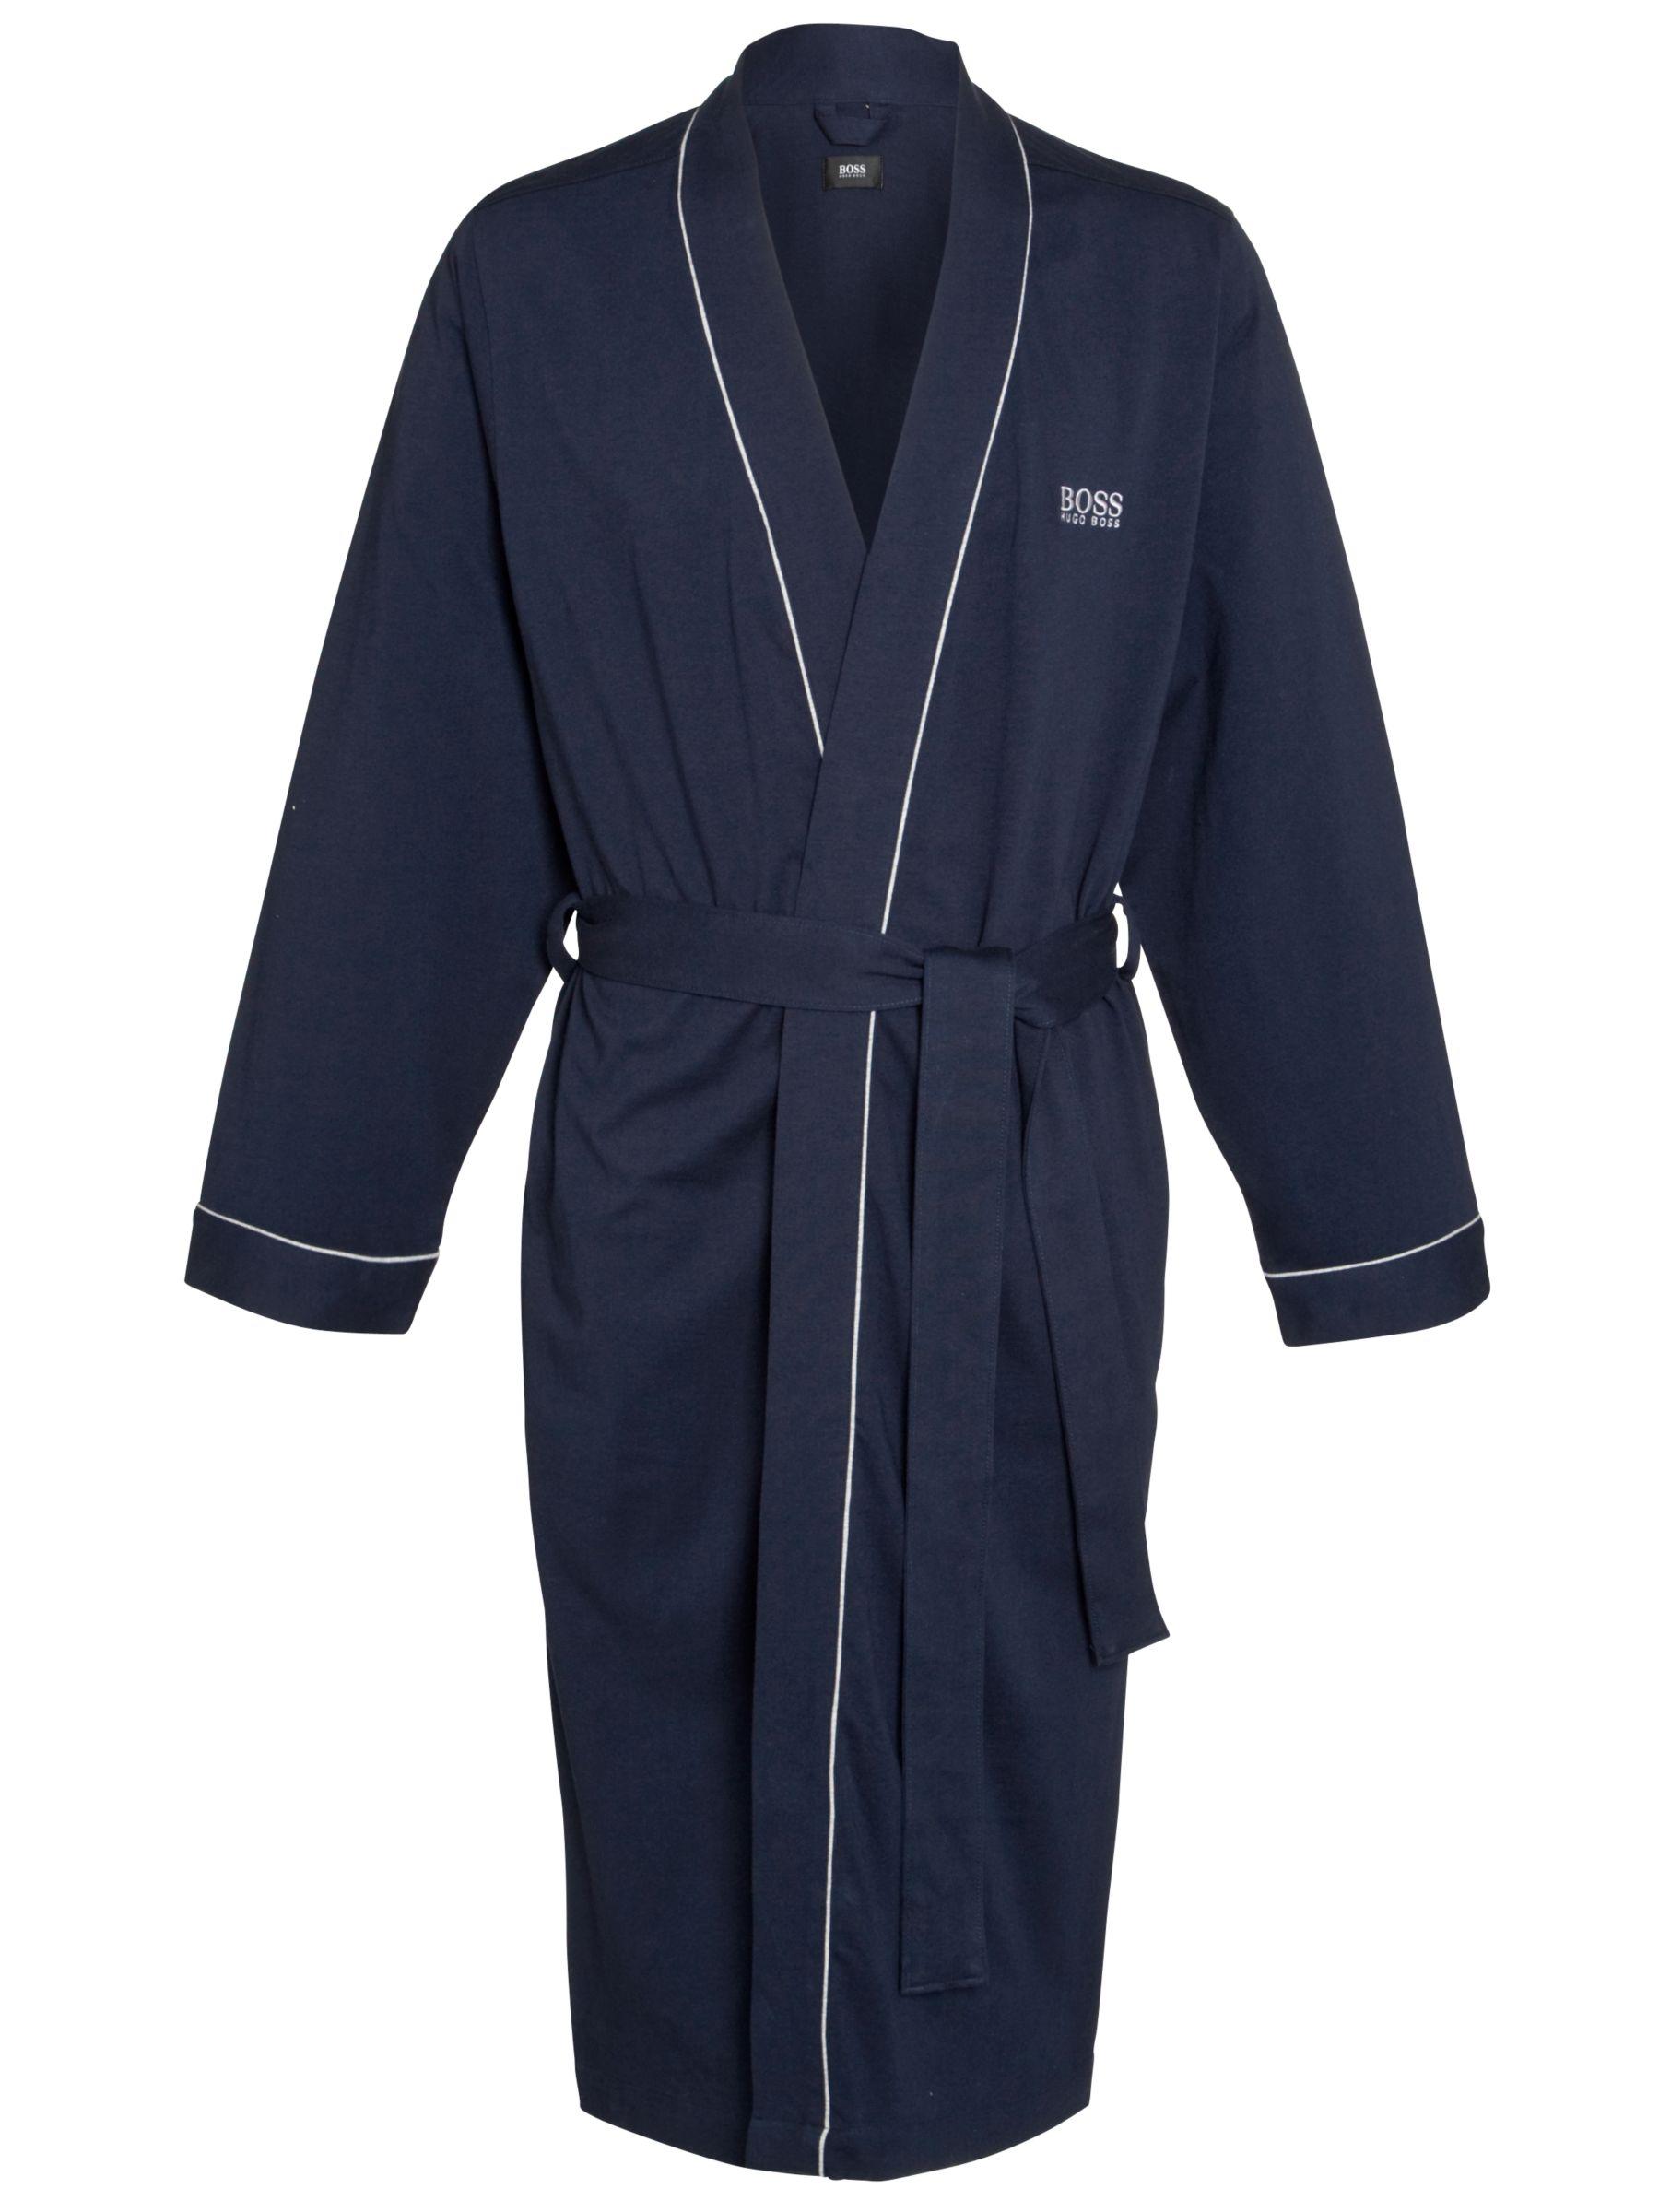 Hugo Boss Kimono Robe, Navy